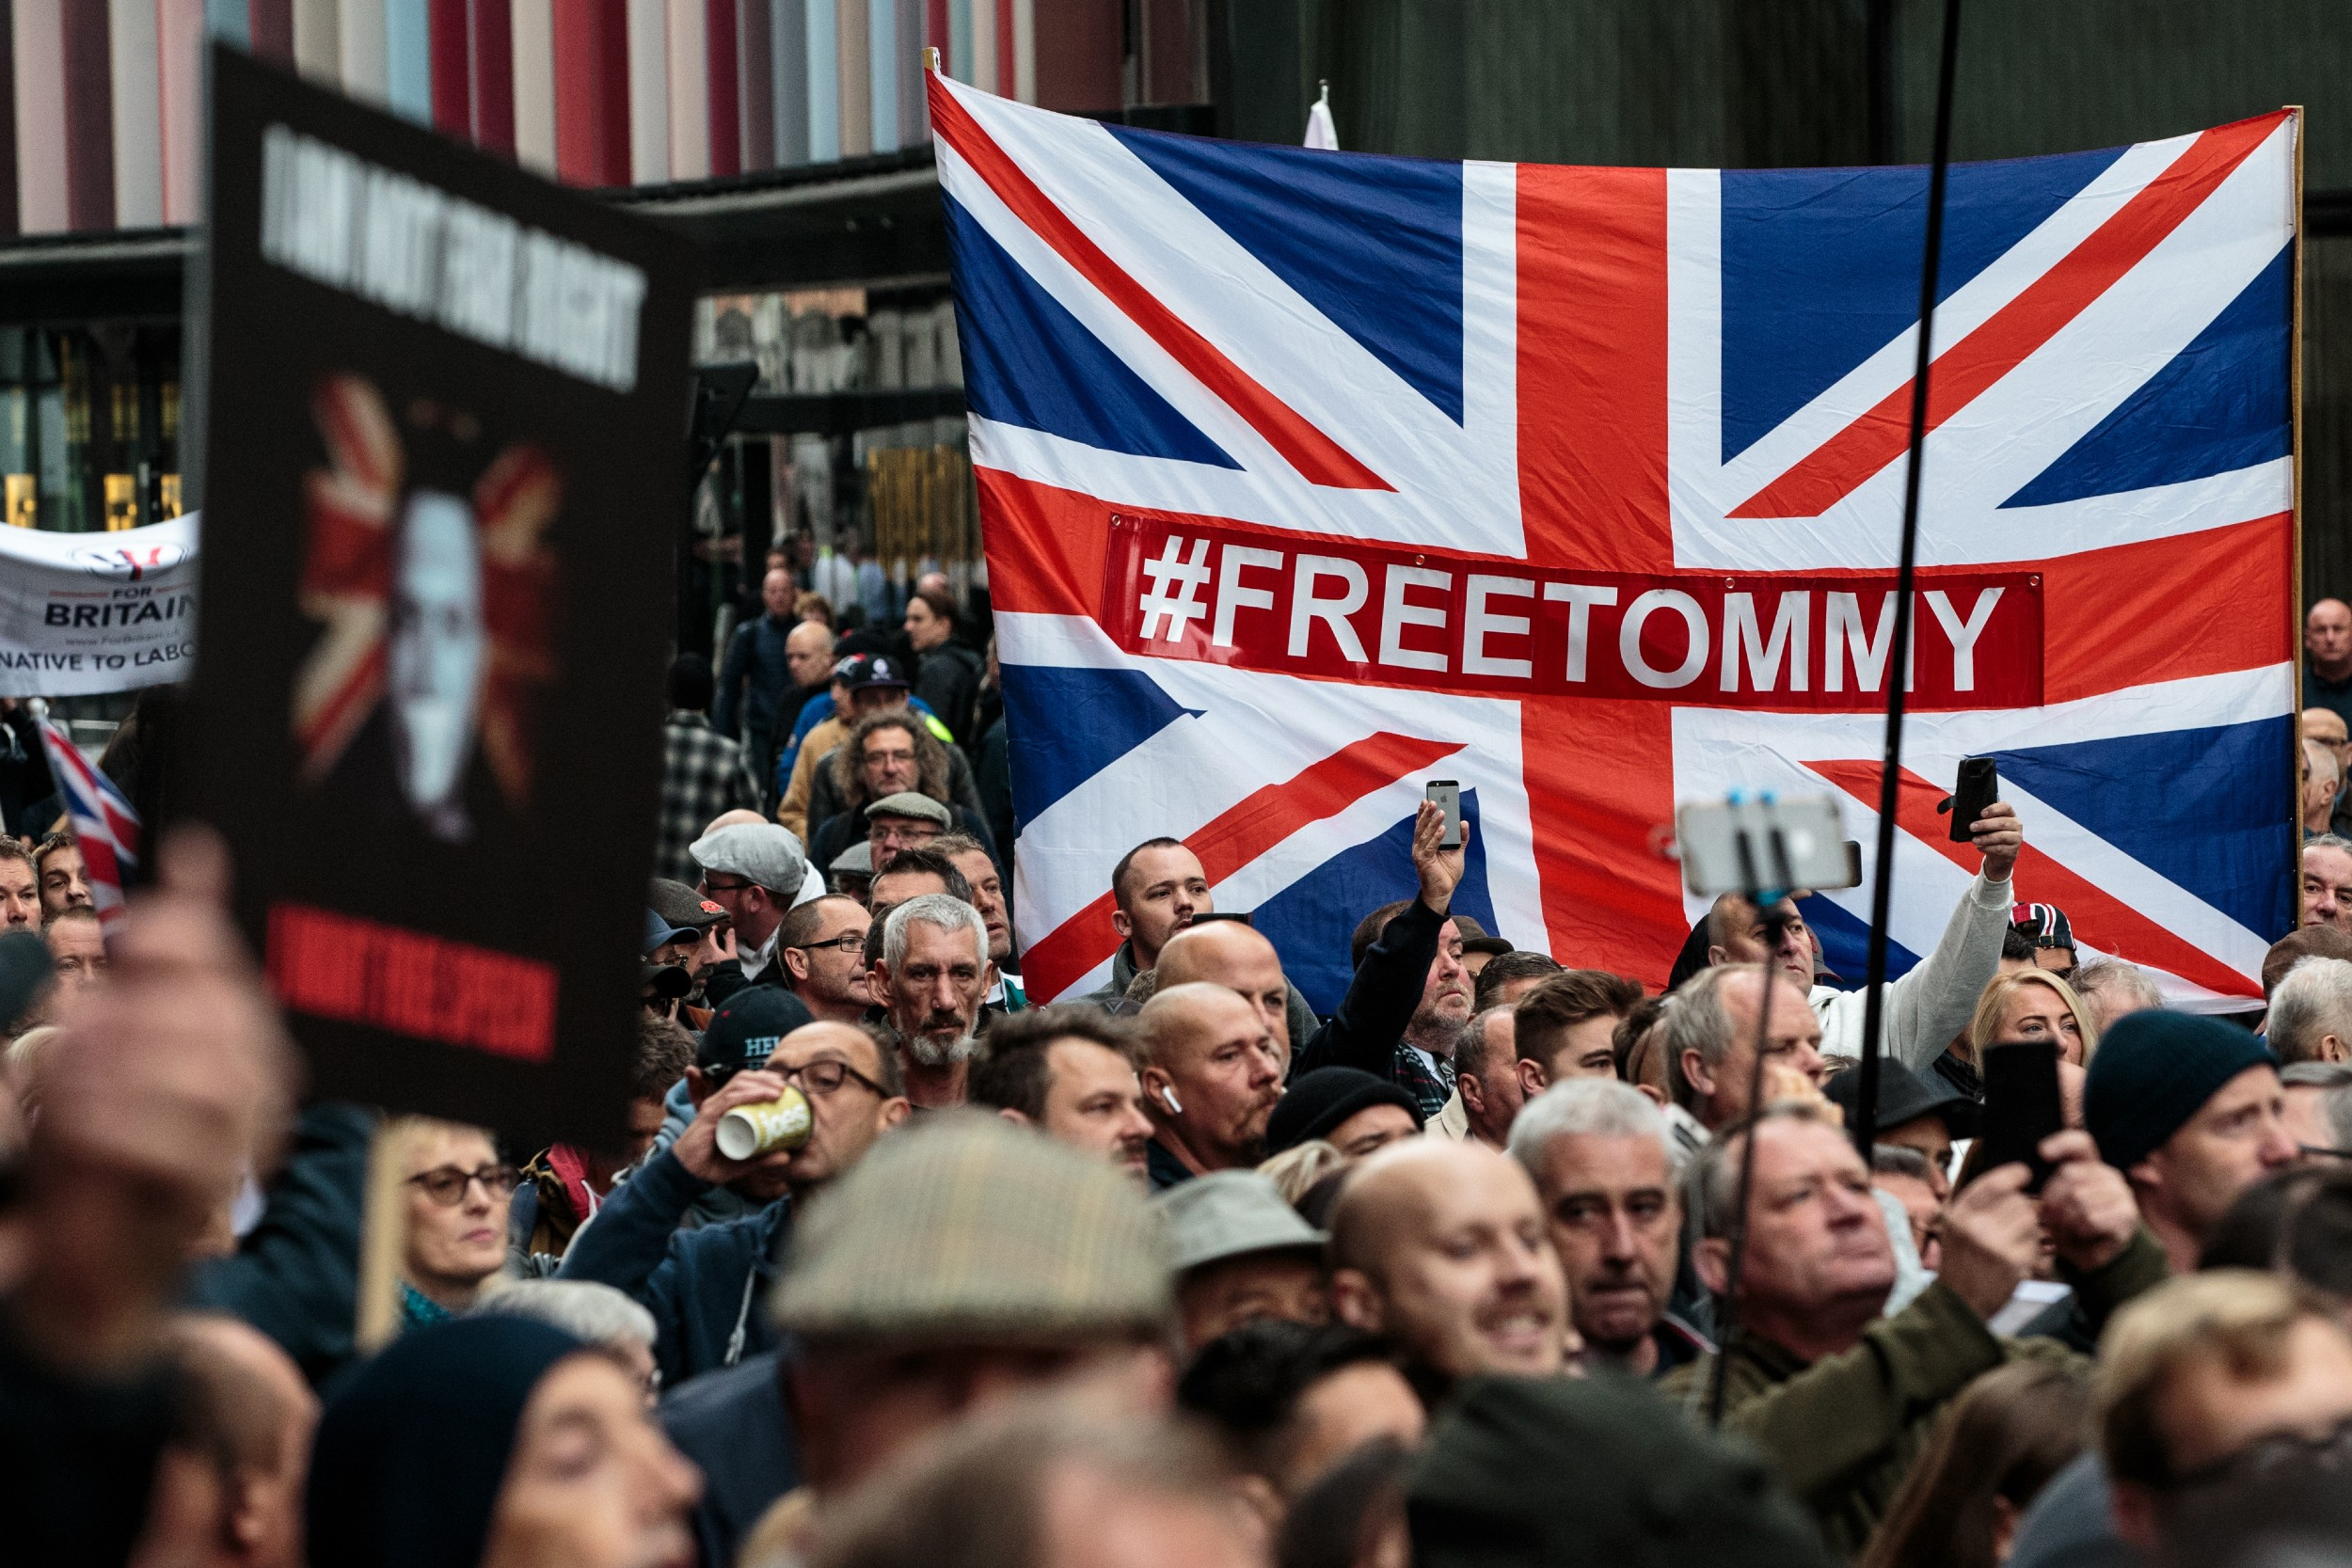 Demonstranti u Londonu zahtevaju oslobađanje Tomija Robinsona (Foto: Jack Taylor/Getty Images)